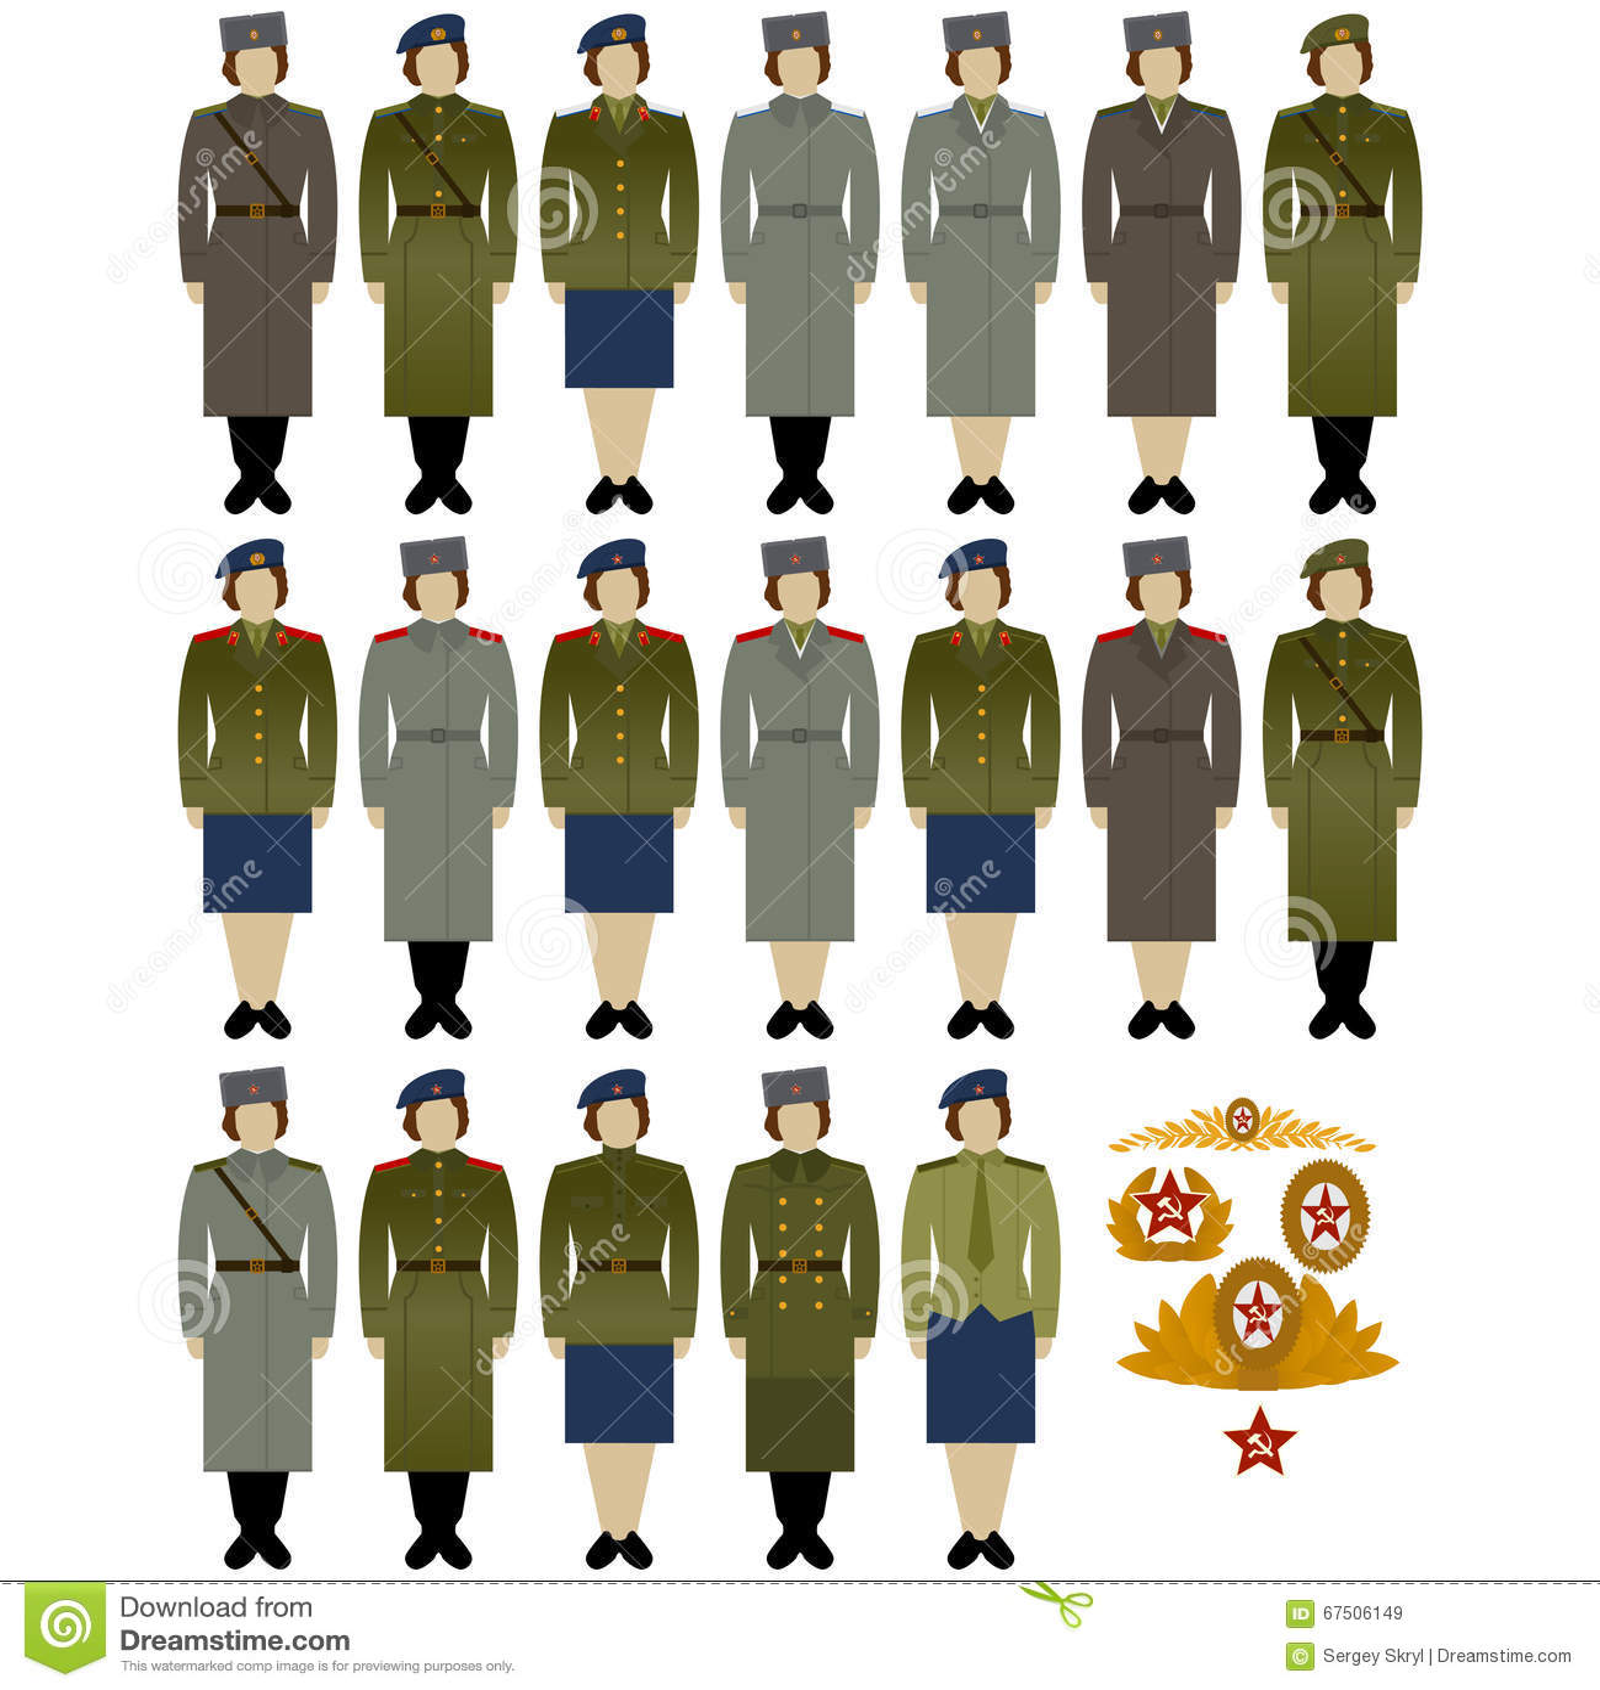 5595c0418df Στρατιωτικές στολές του σοβιετικών στρατού και του ναυτικό-1 ...